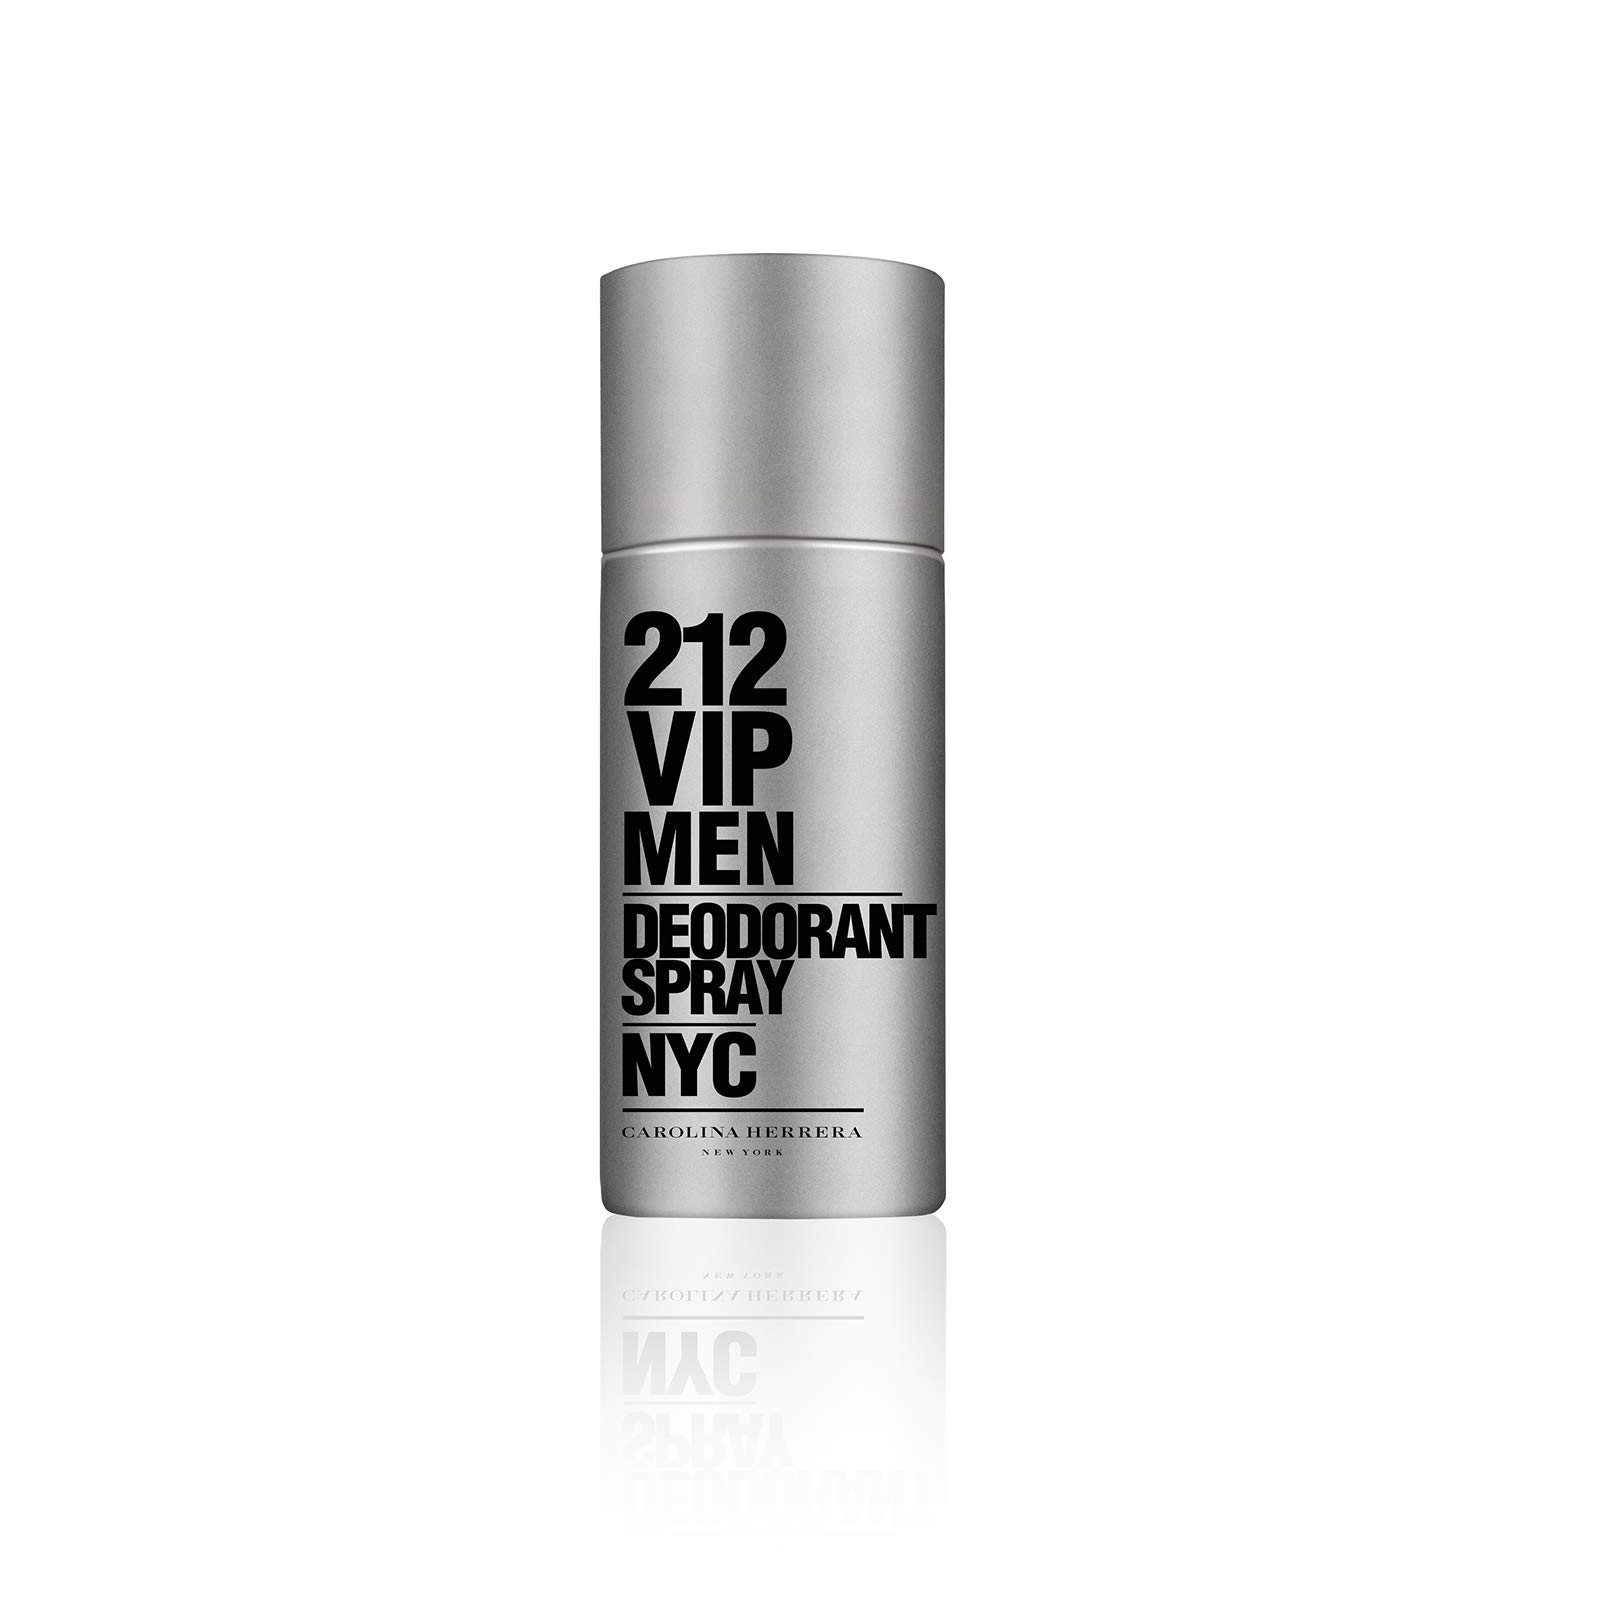 Carolina Herrera 212 VIP Deodorant Spray for Men, 5 Ounce